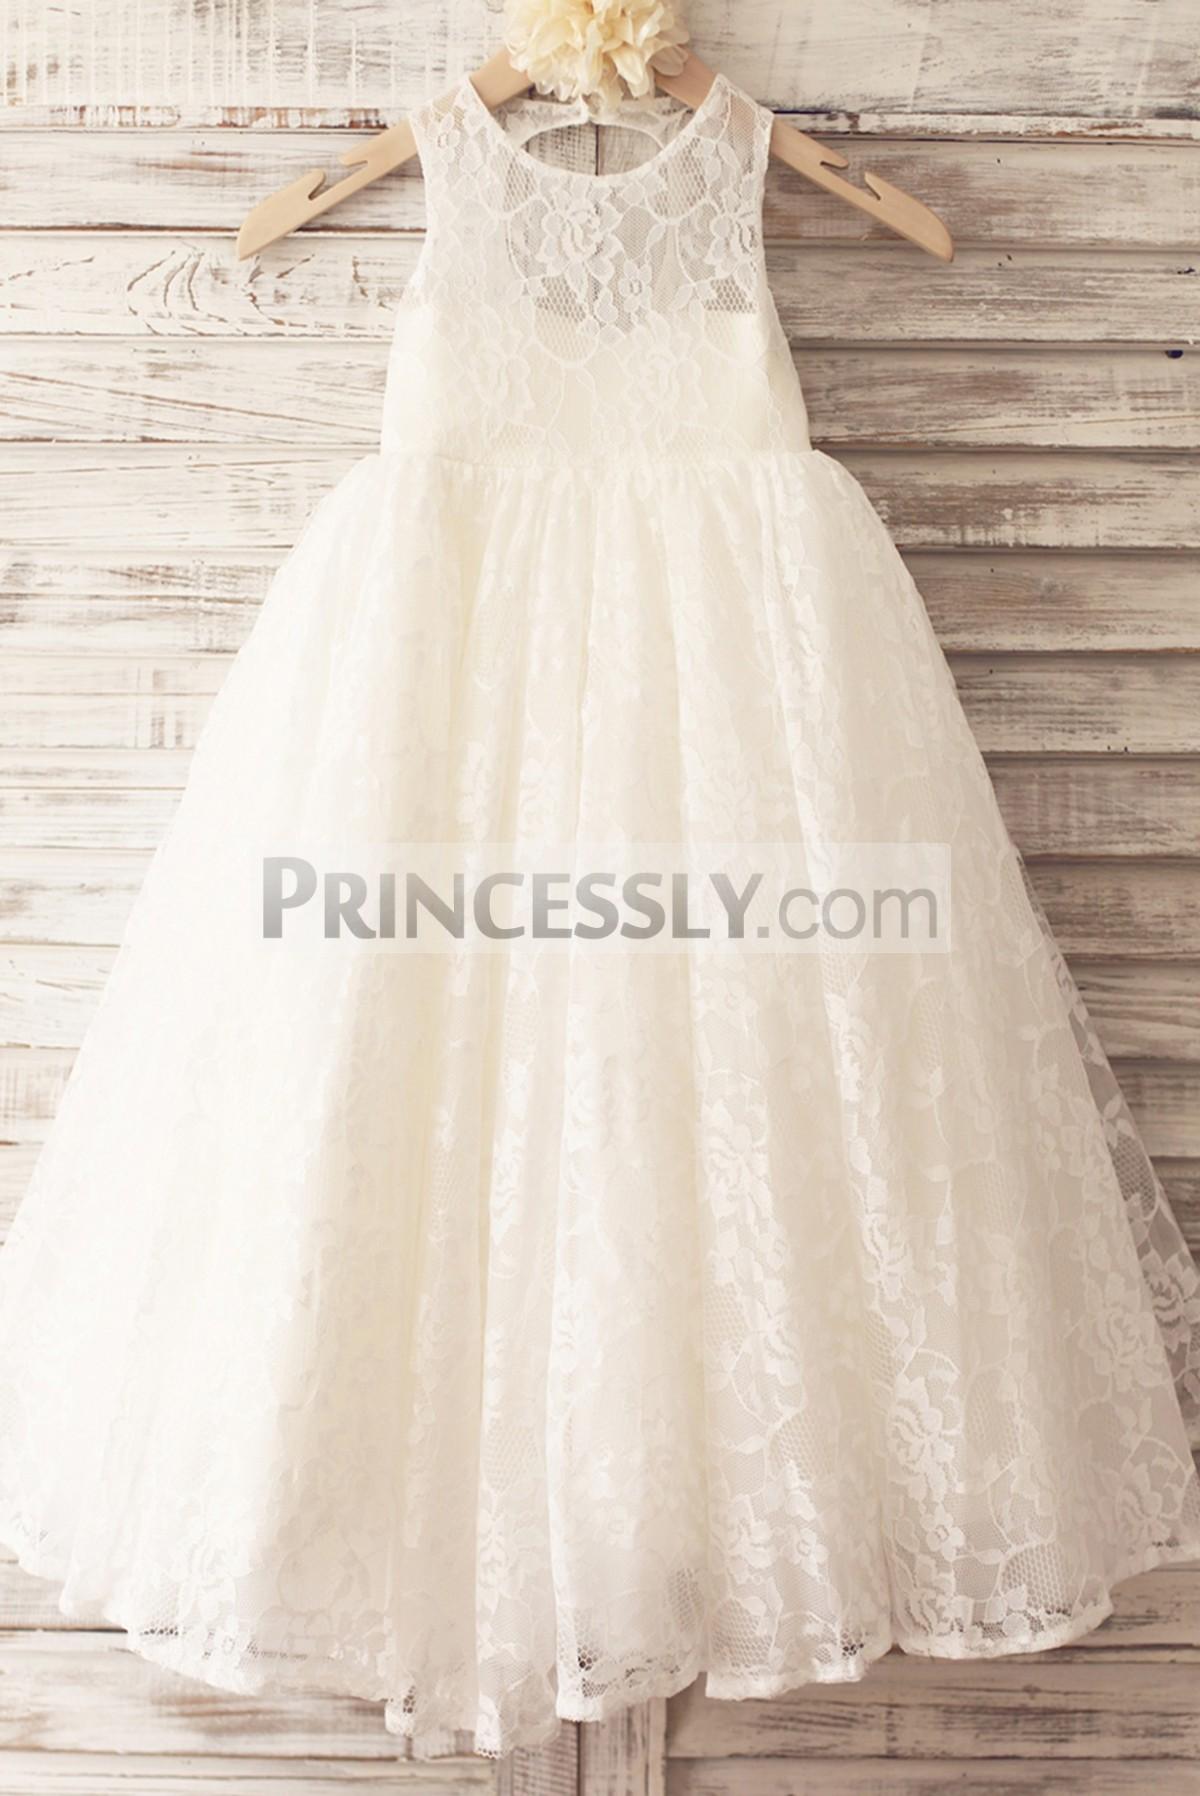 Princessly.com-K1004016-Princess Ivory Lace Keyhole Back Floor Length Wedding Flower Girl Dress-31